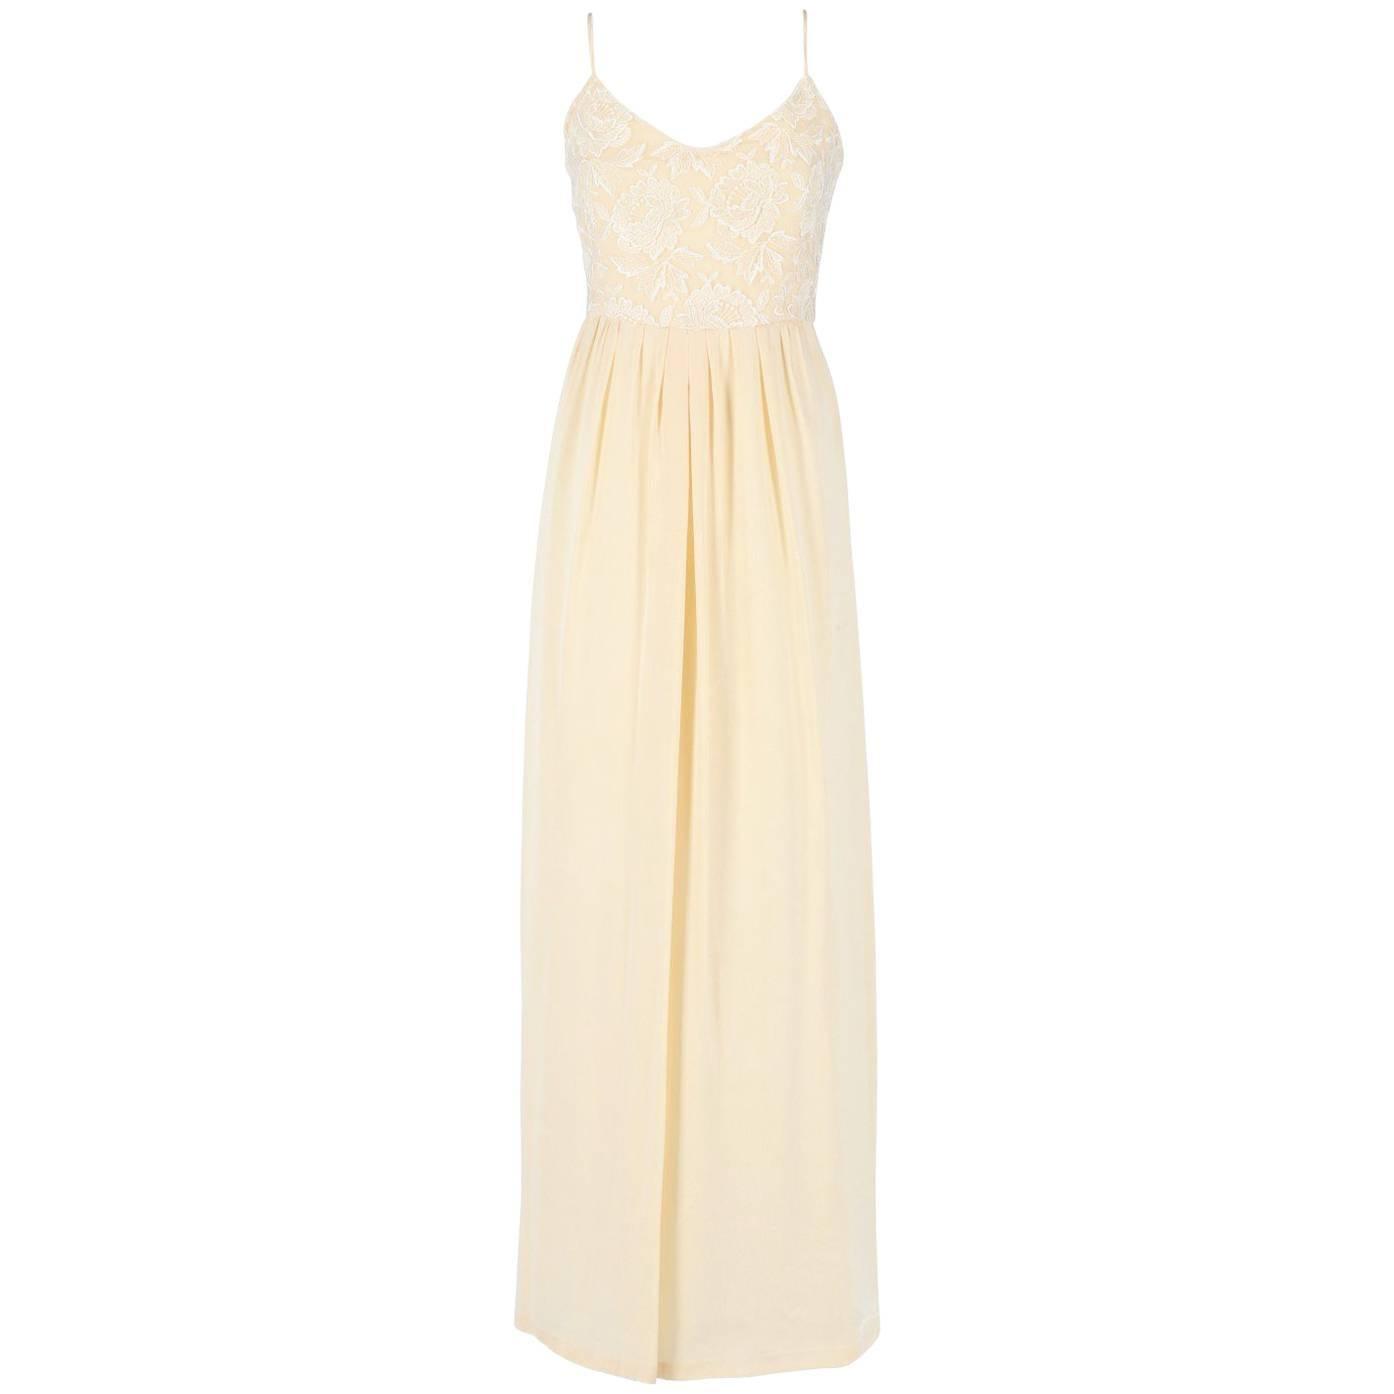 Custard Silk Vintage Wedding Dress, 1960s